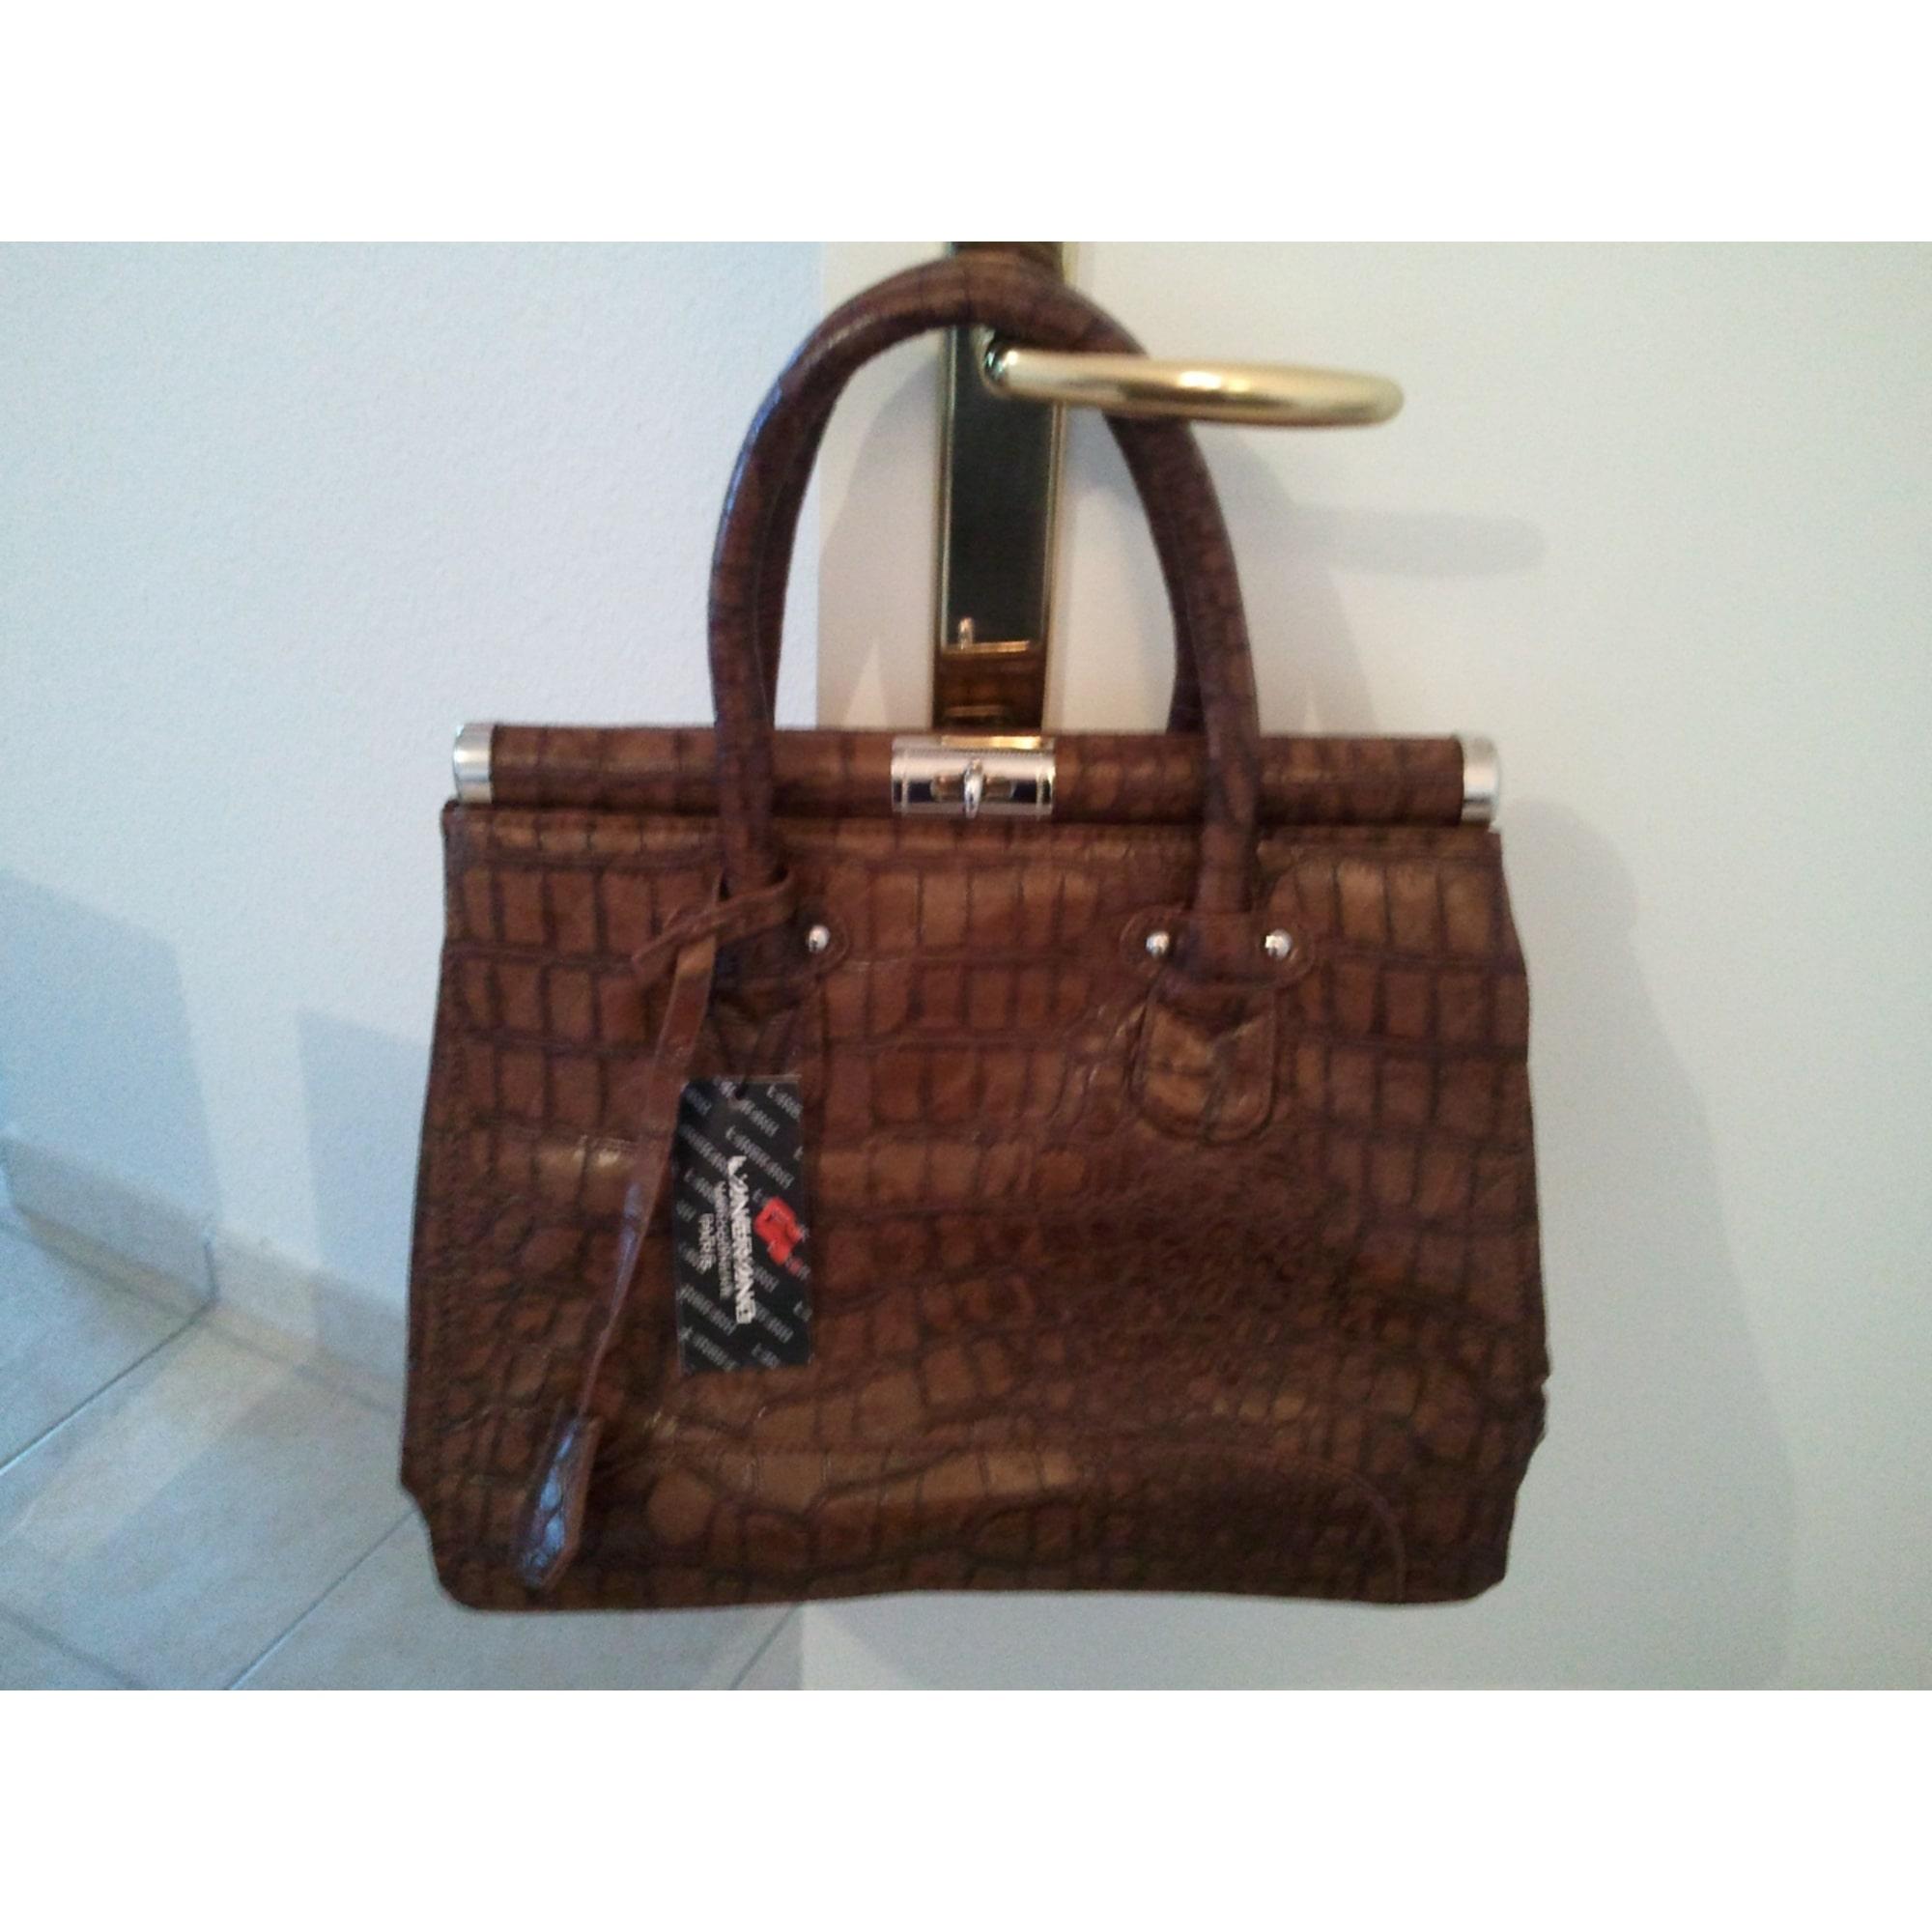 9027932830 Sac à main en cuir LANGRAND marron vendu par Tijulie20757 - 147910